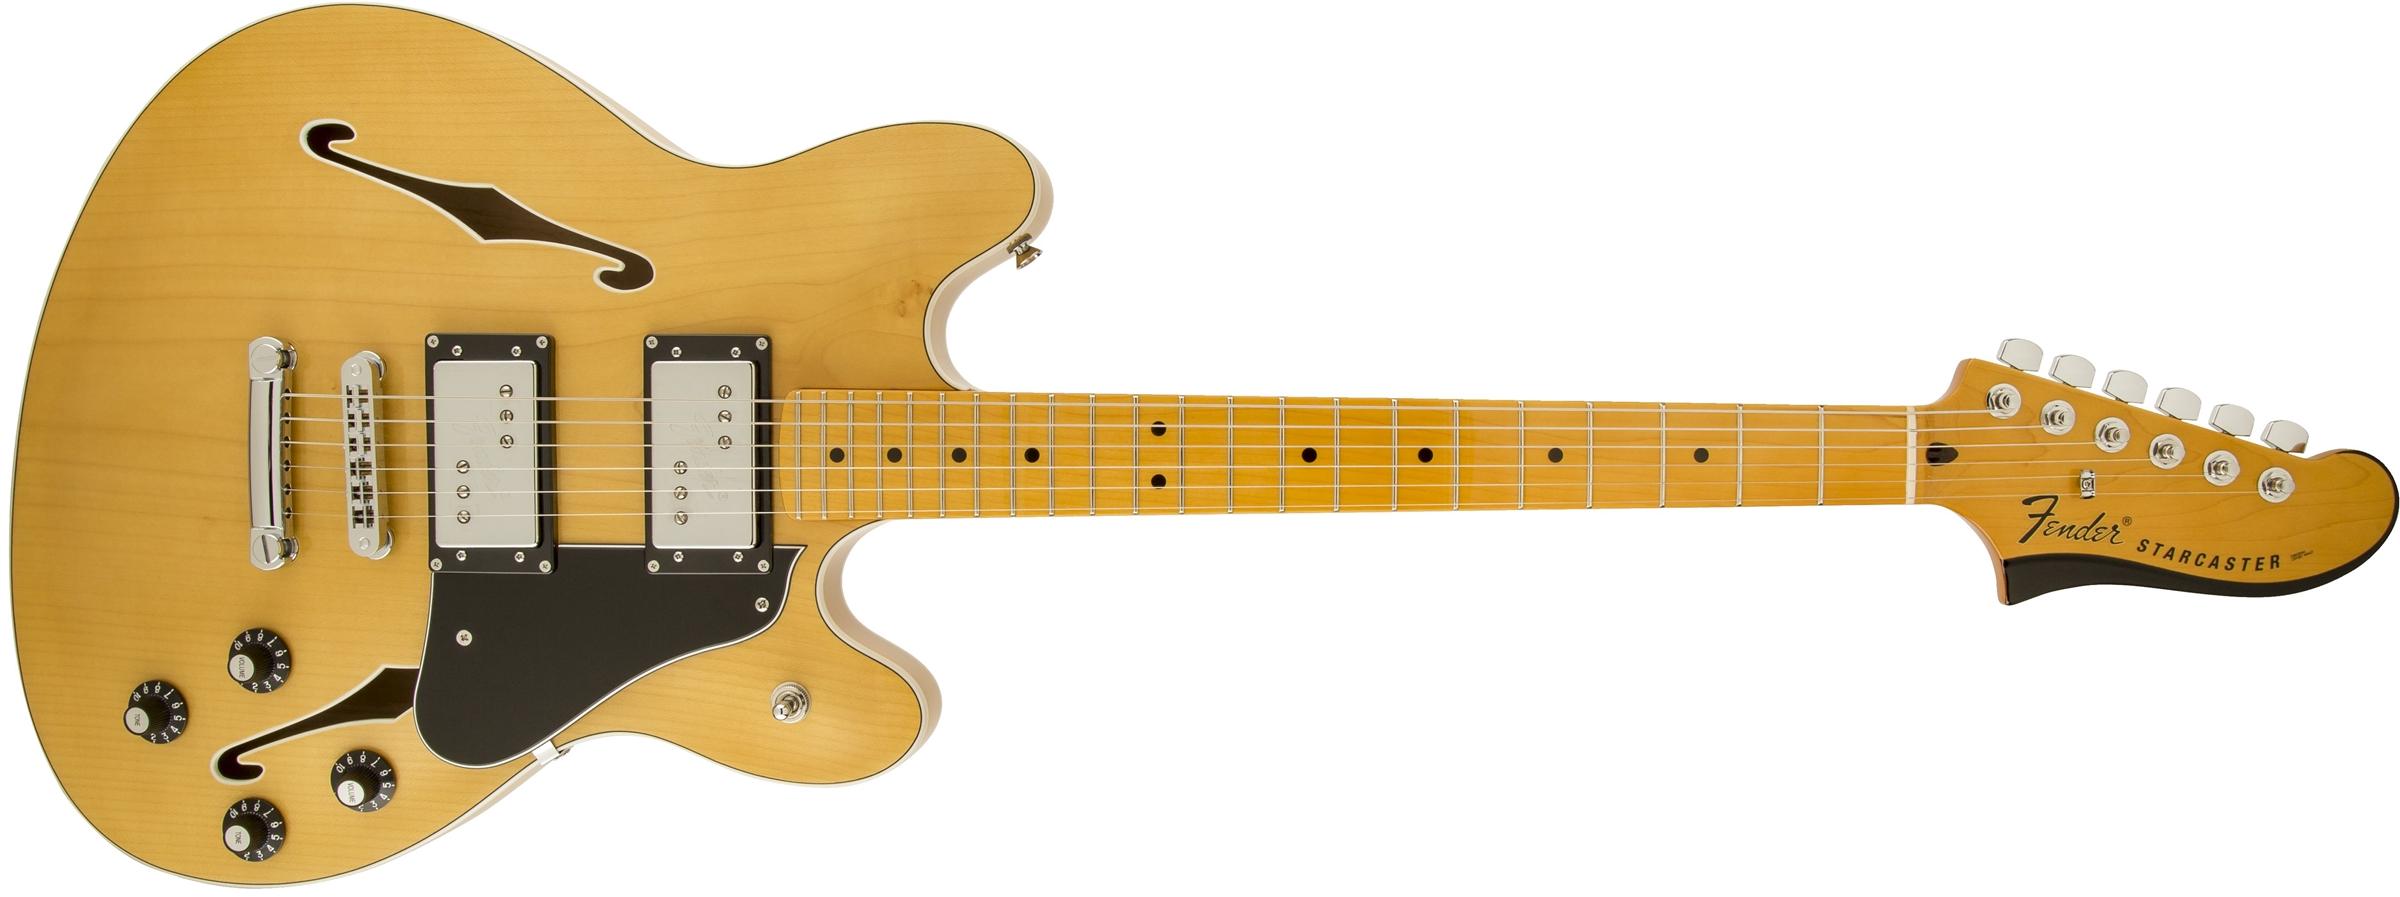 starcaster guitar fender electric guitars rh shop fender com Fender Strat Wiring Diagram Fender Standard Strat Wiring